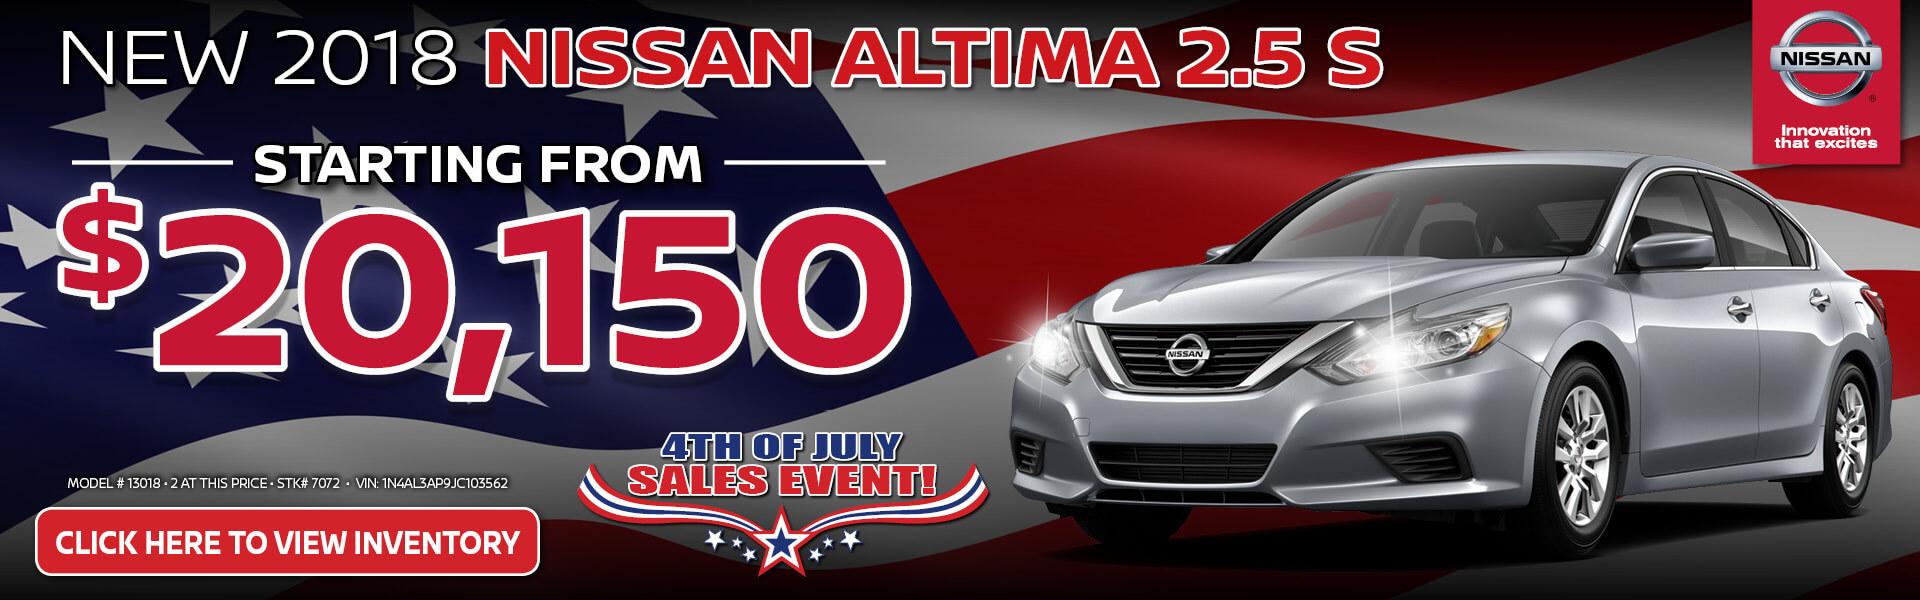 Nissan Altima $20,150 Purchase